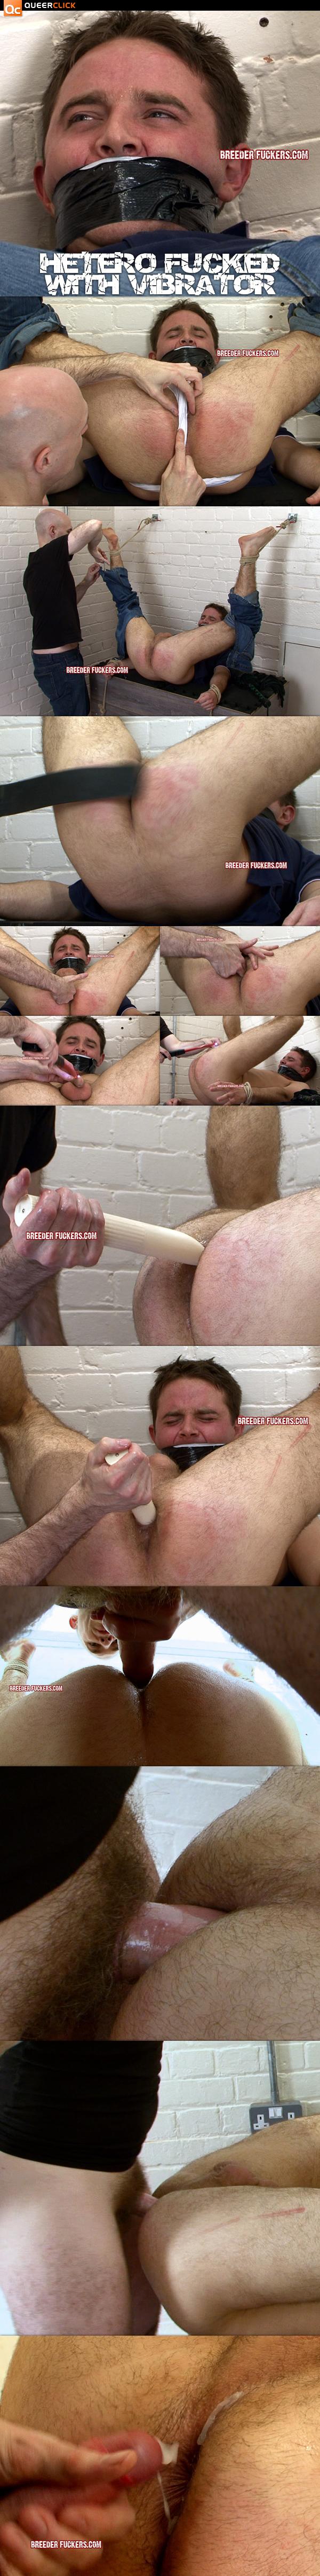 Hetero Fucked with Vibrator at BreederFuckers